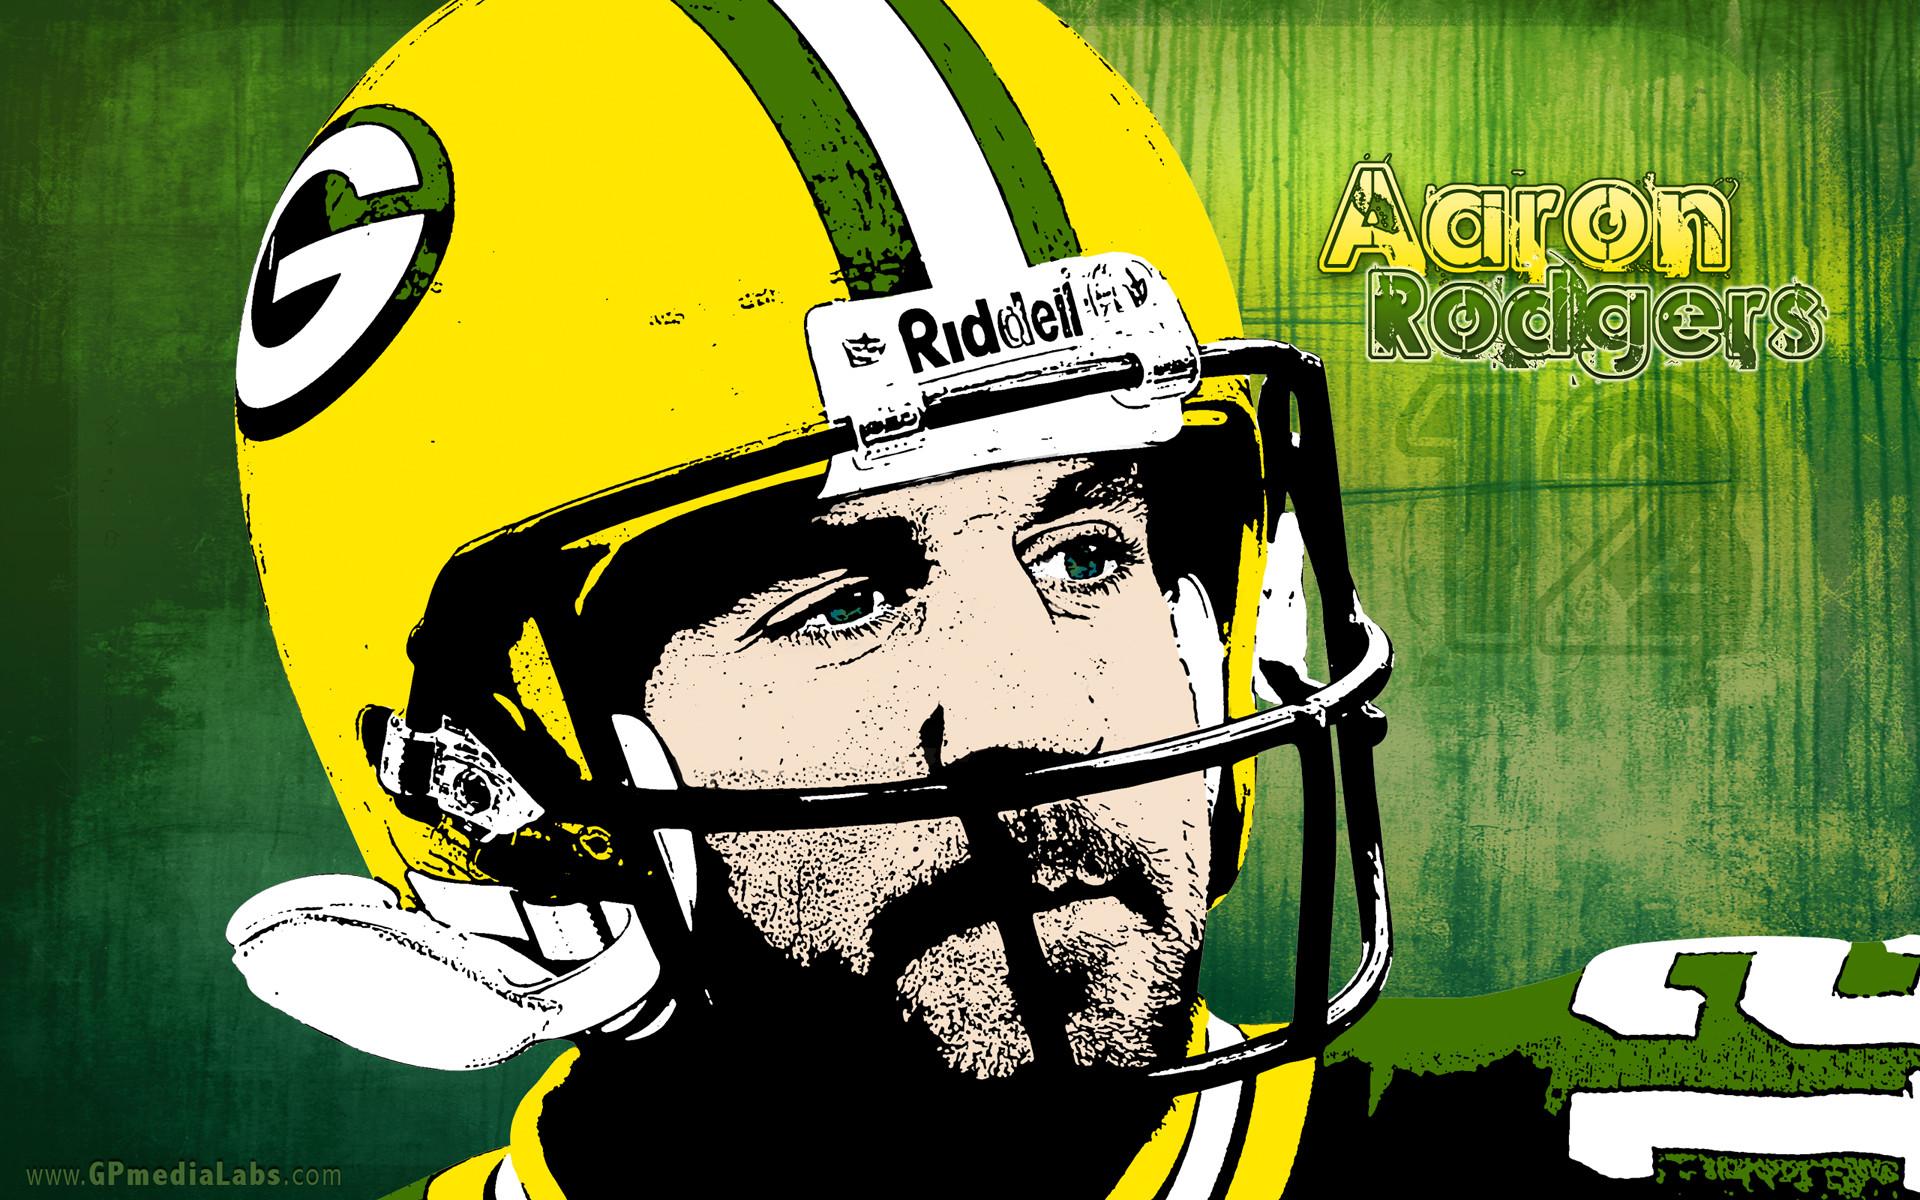 Green Bay Packers Wallpaper – Aaron Rodgers #12. Download wallpaper: 1440 x  900 • • 2560 x 1600